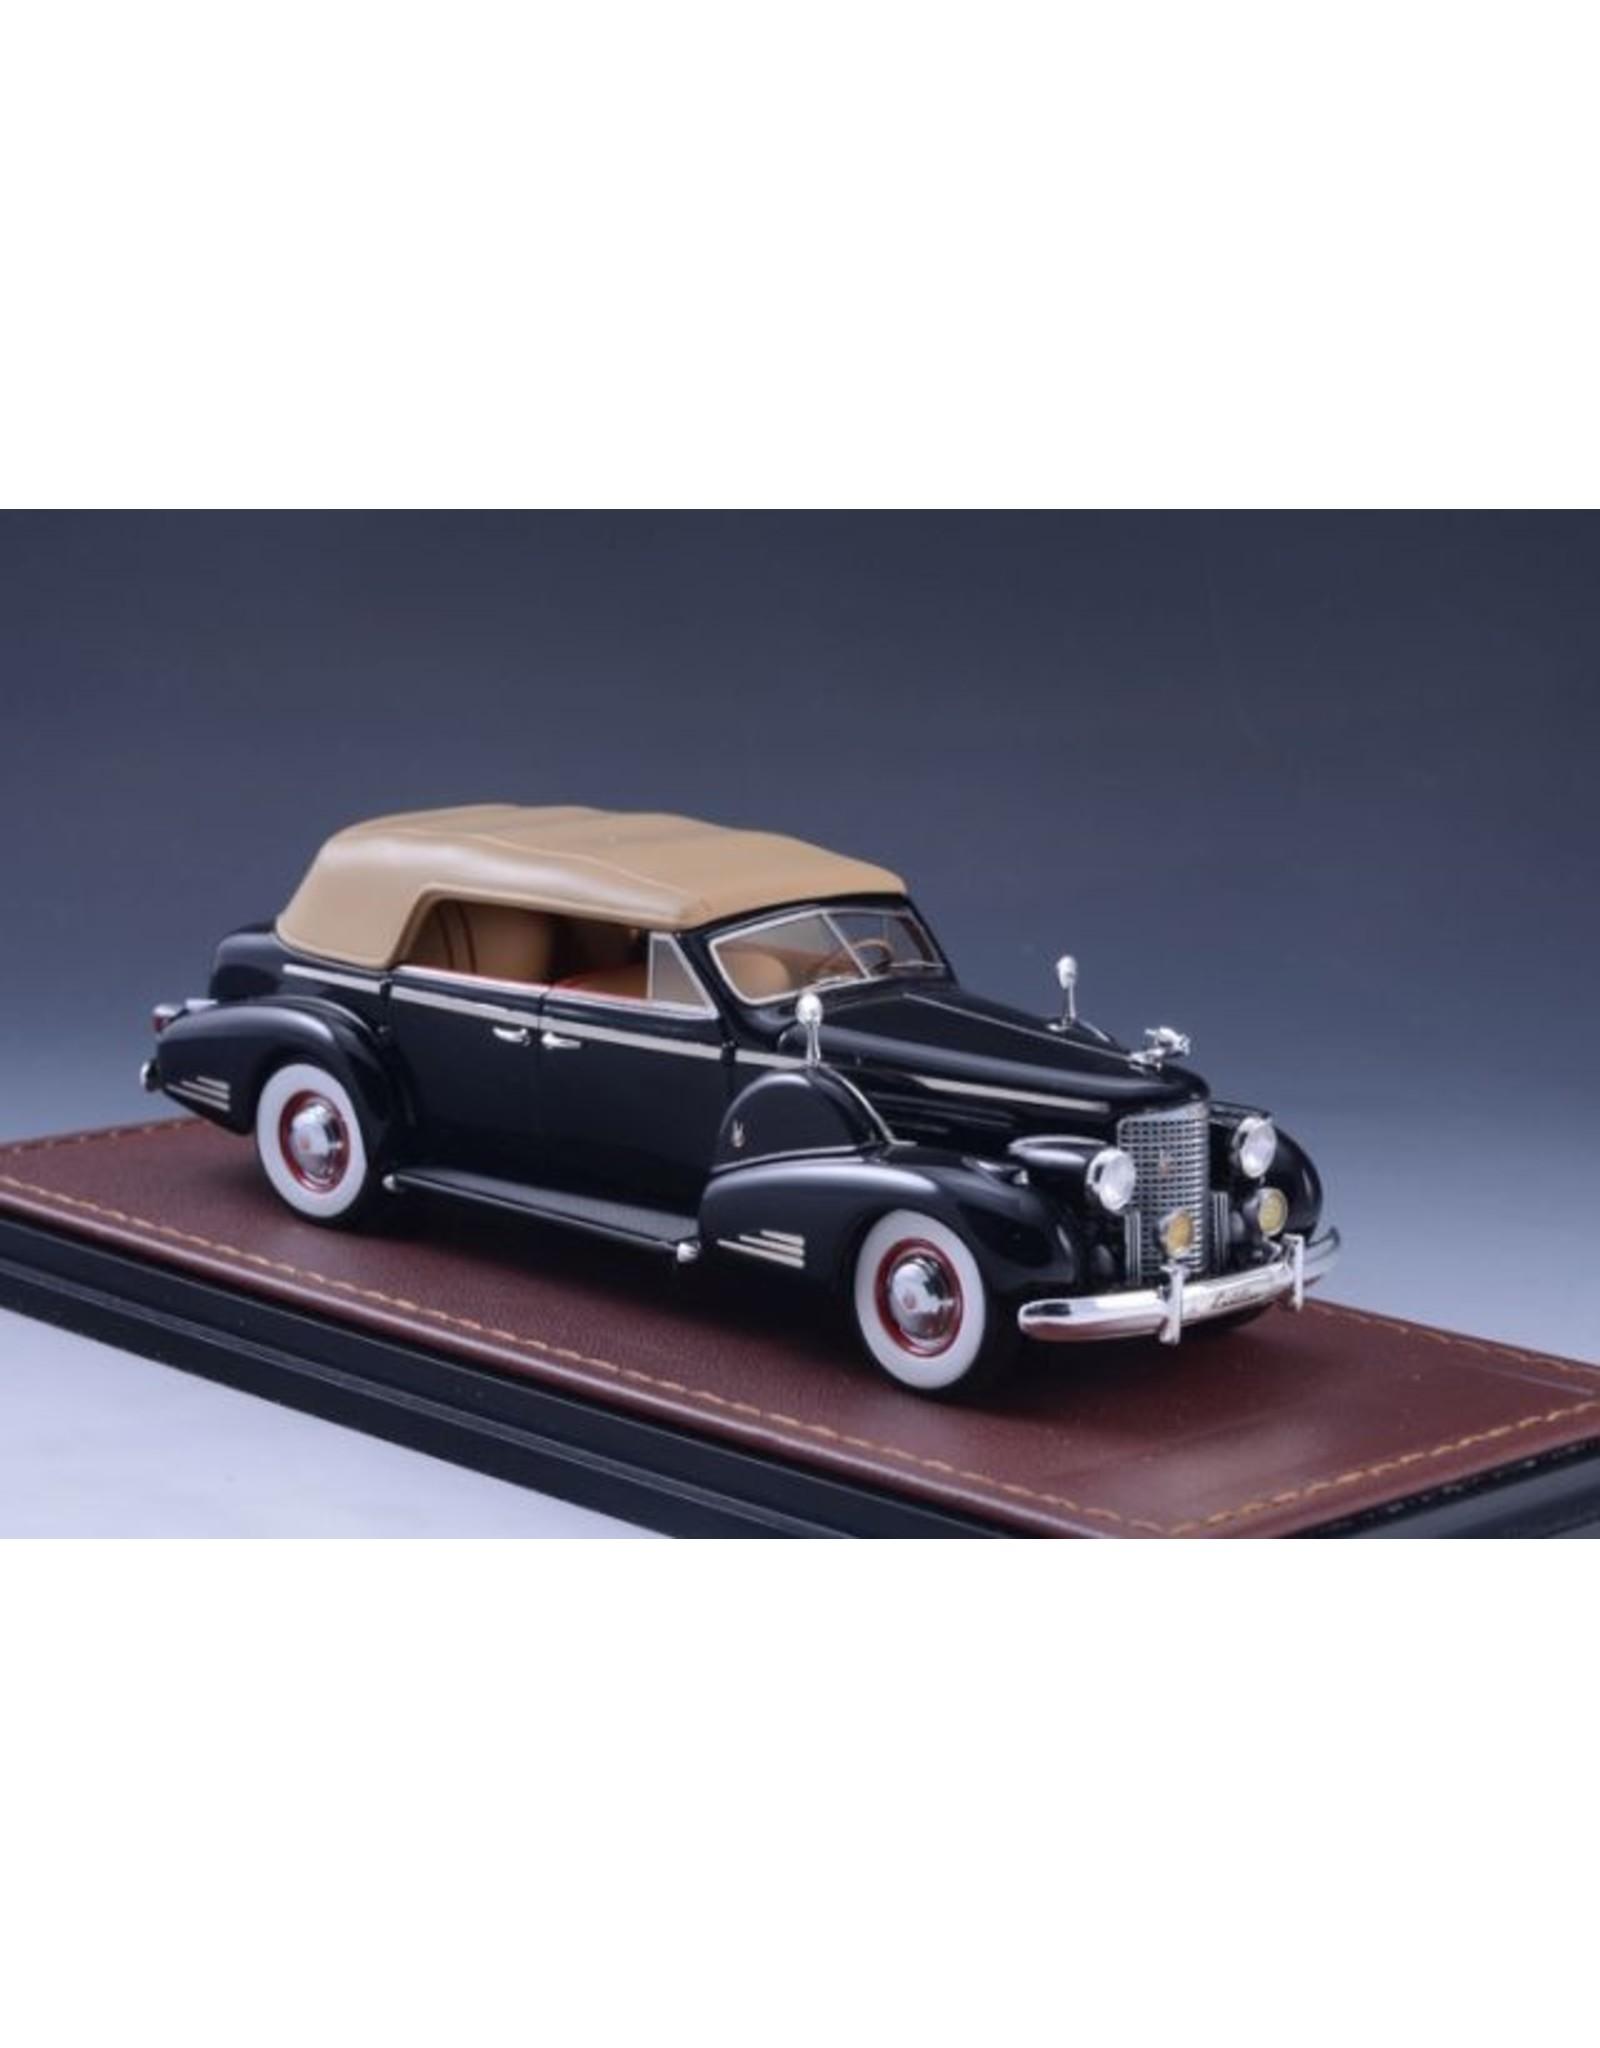 Cadillac CADILLAC V16 SERIES 90 FLEETWOOD SEDAN CONVERTIBLE-1938(black)closed top.